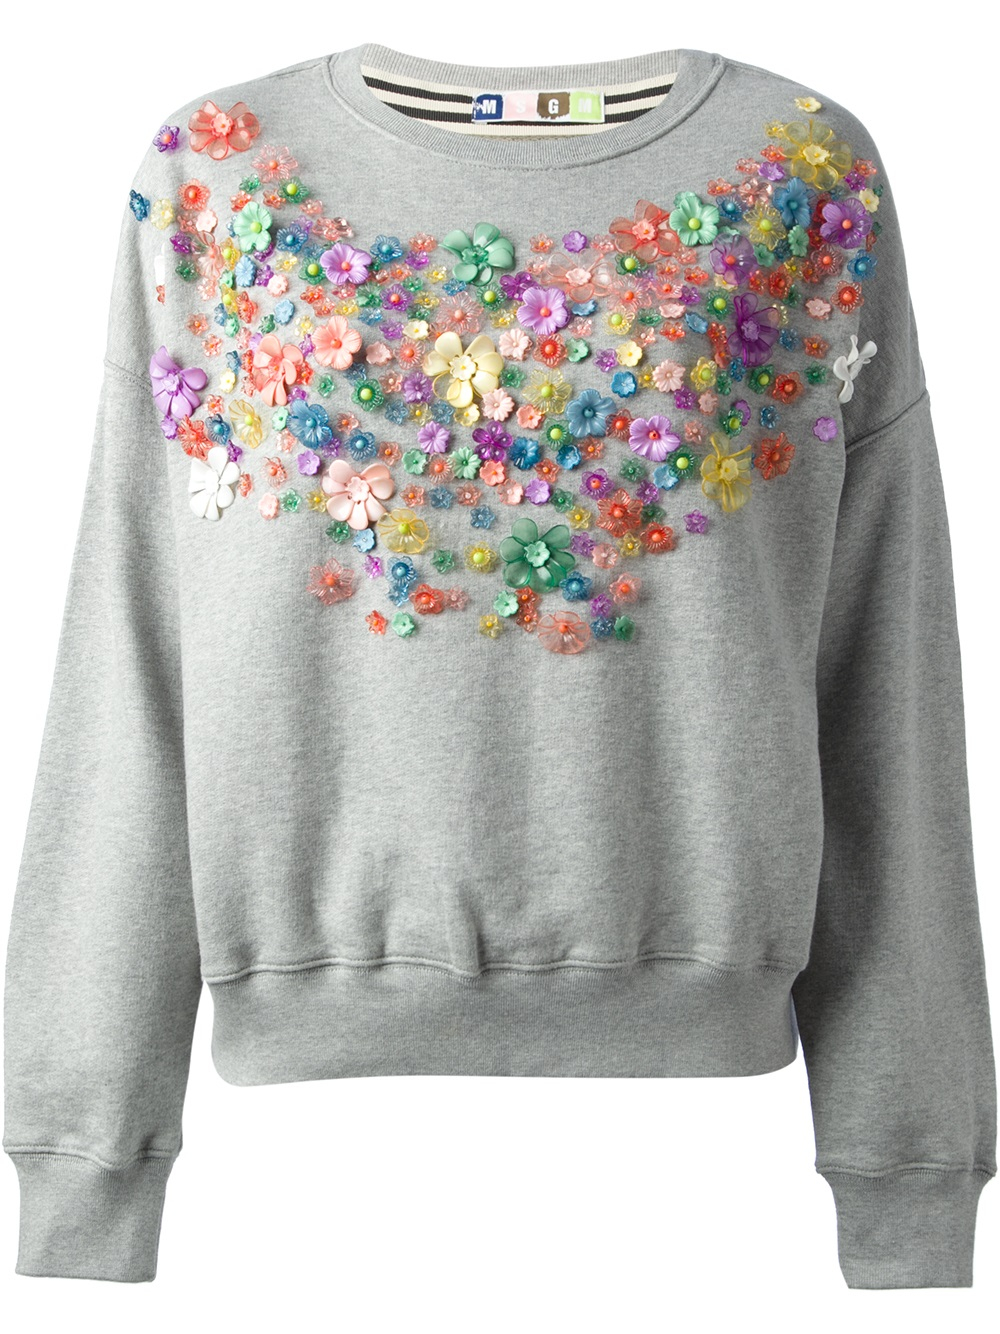 Women S Varsity Sweater